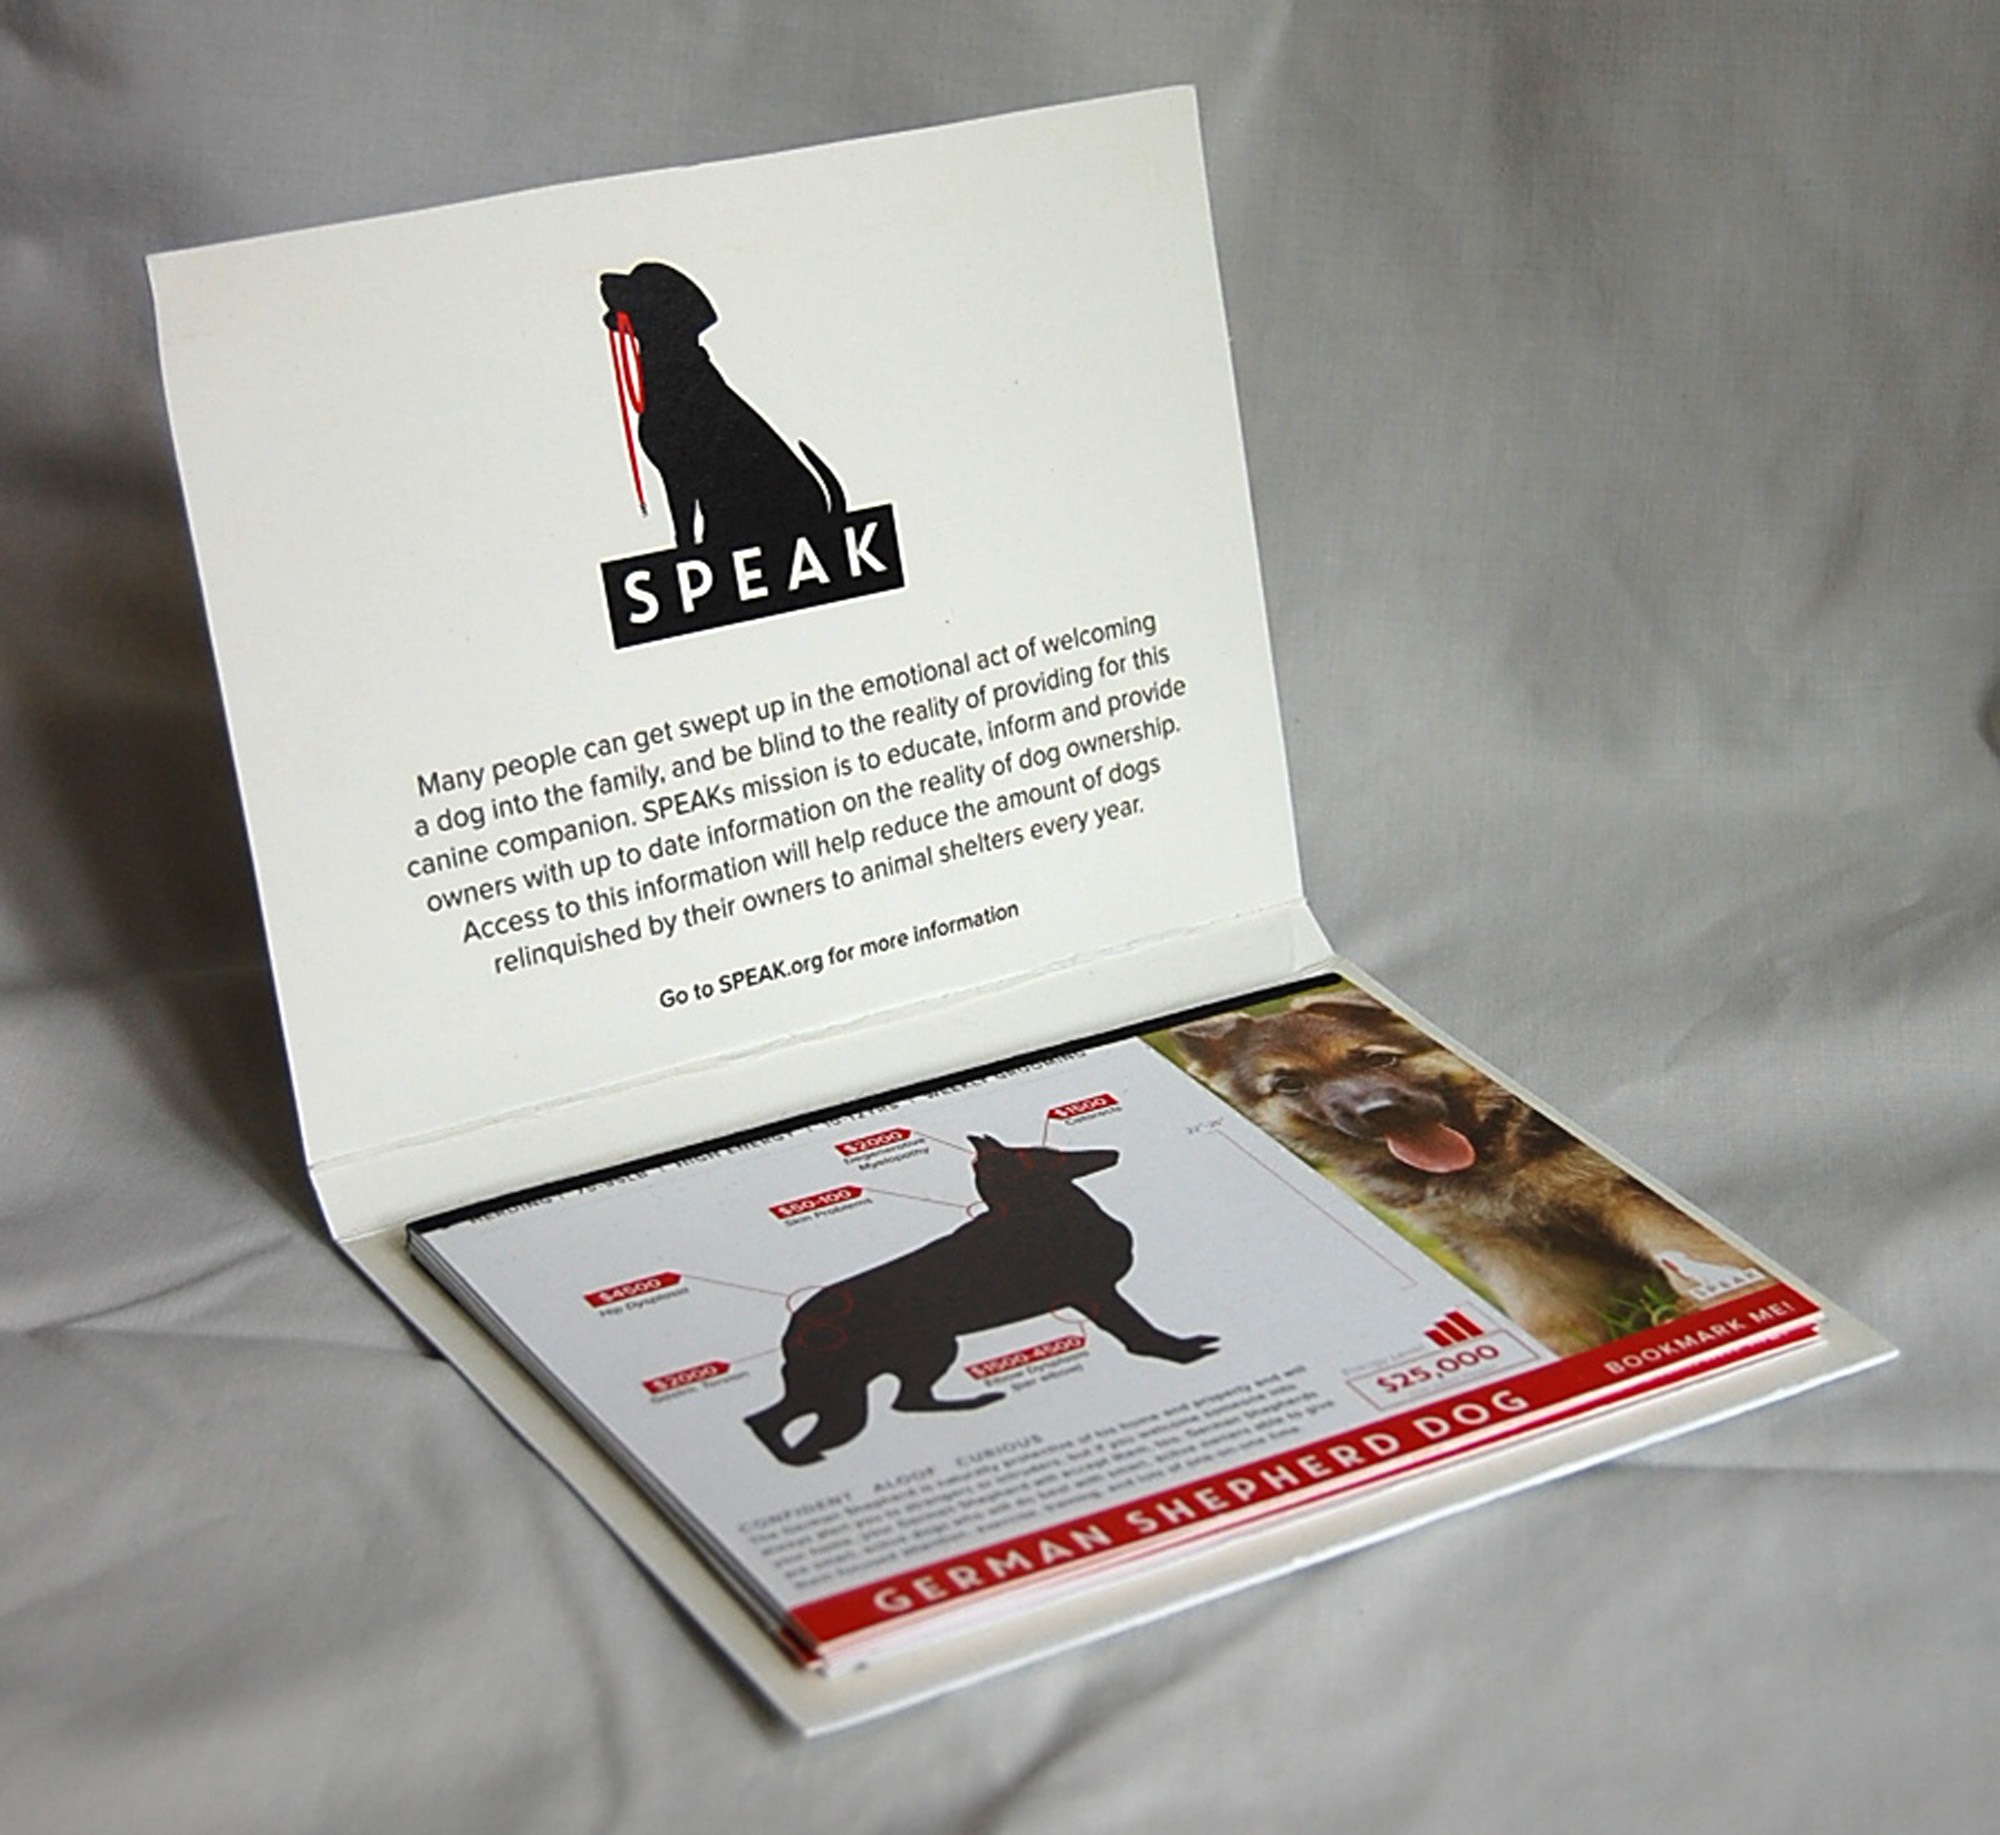 Speak_Booklet.jpg